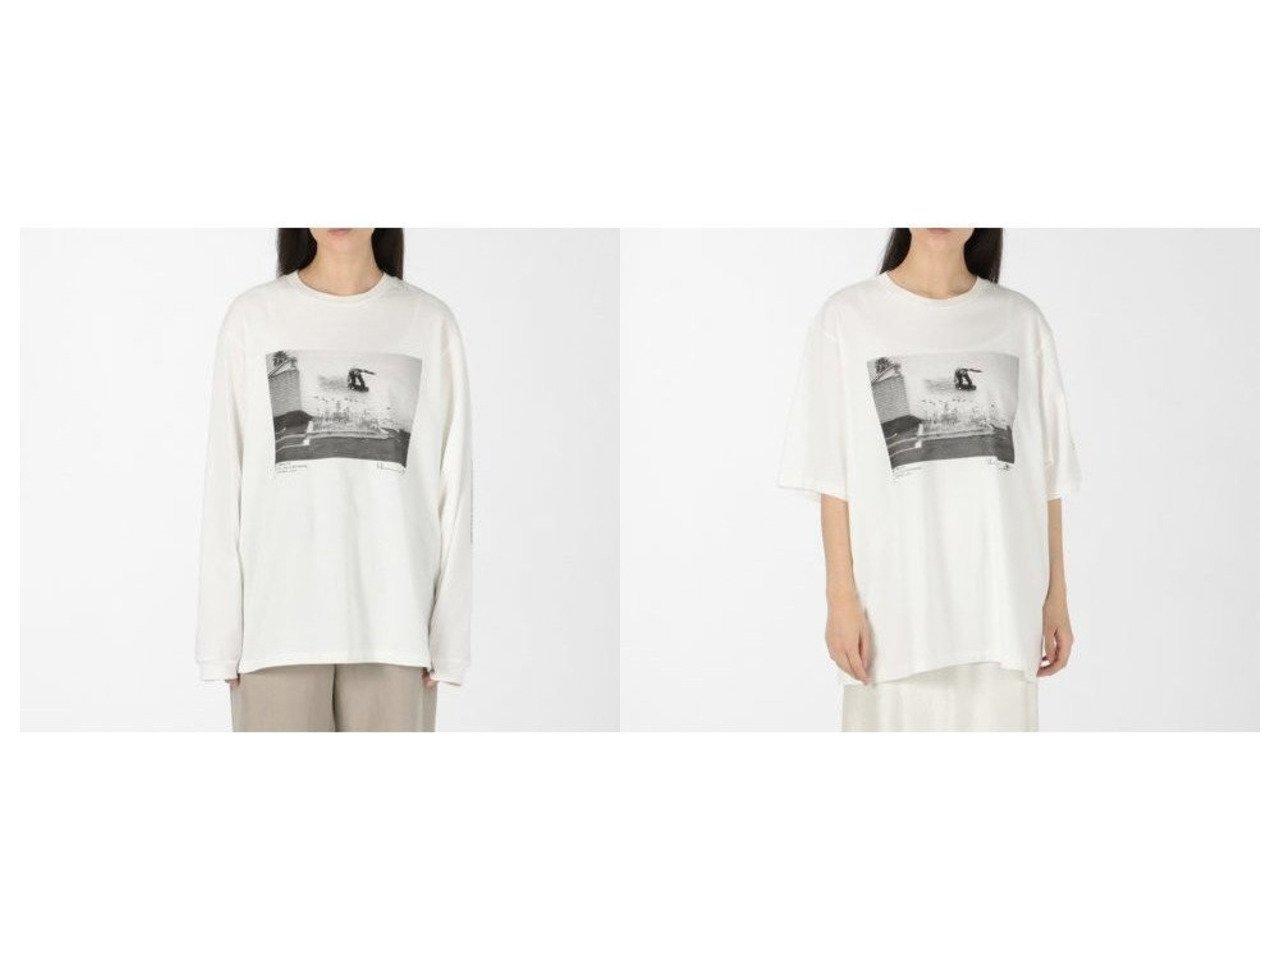 【JANE SMITH/ジェーンスミス】のJACK FARDELL WALL RIDE & GRIND &S T-SHIRT&JACK FARDELL WALL RIDE & GRIND &S T-SHIRT トップス・カットソーのおすすめ!人気、トレンド・レディースファッションの通販 おすすめで人気の流行・トレンド、ファッションの通販商品 メンズファッション・キッズファッション・インテリア・家具・レディースファッション・服の通販 founy(ファニー) https://founy.com/ ファッション Fashion レディースファッション WOMEN トップス Tops Tshirt シャツ/ブラウス Shirts Blouses ロング / Tシャツ T-Shirts カットソー Cut and Sewn カットソー キャンバス 長袖 A/W 秋冬 AW Autumn/Winter / FW Fall-Winter 半袖 S/S 春夏 SS Spring/Summer |ID:crp329100000011170